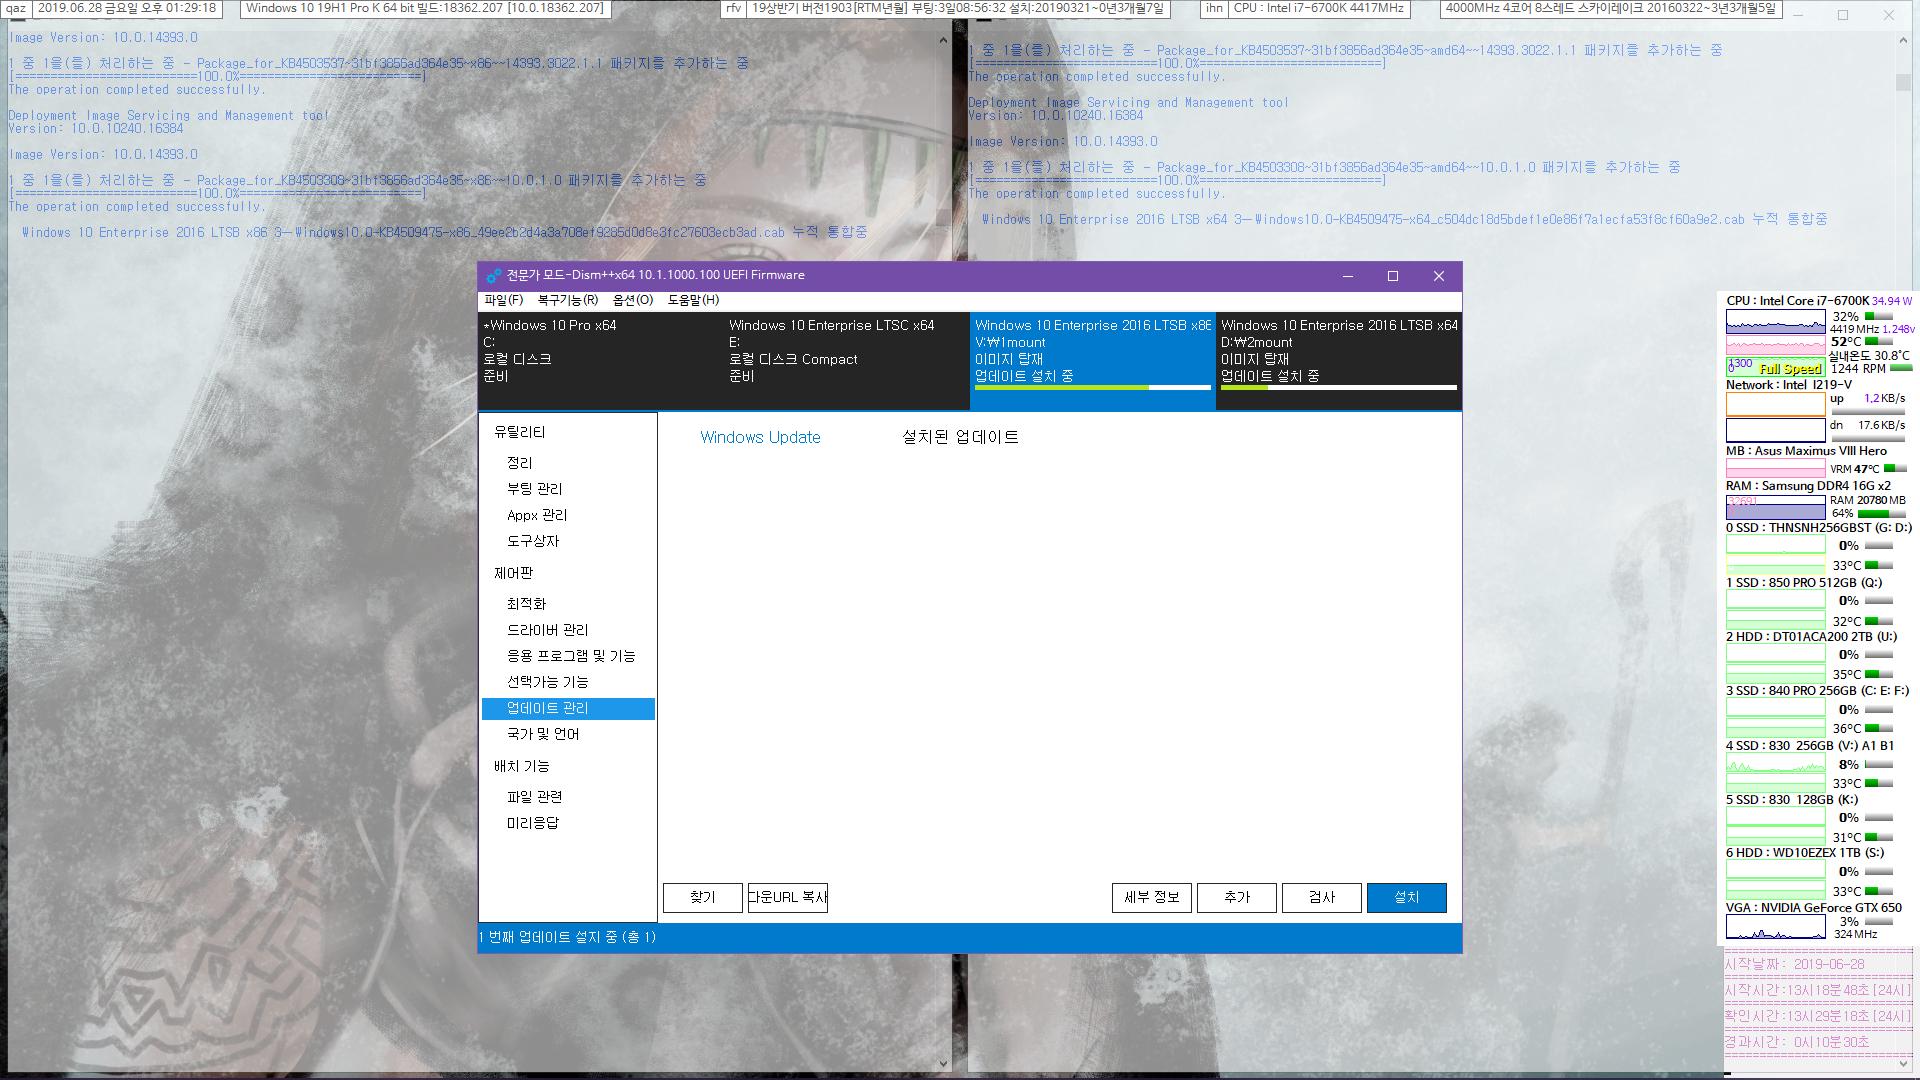 Windows 10 버전 1607 누적 업데이트 KB4509475 (OS 빌드 14393.3056) [2019-06-27 일자] 수시 업데이트 나왔네요 - 2016 LTSB 통합중 입니다 2019-06-28_132918.png